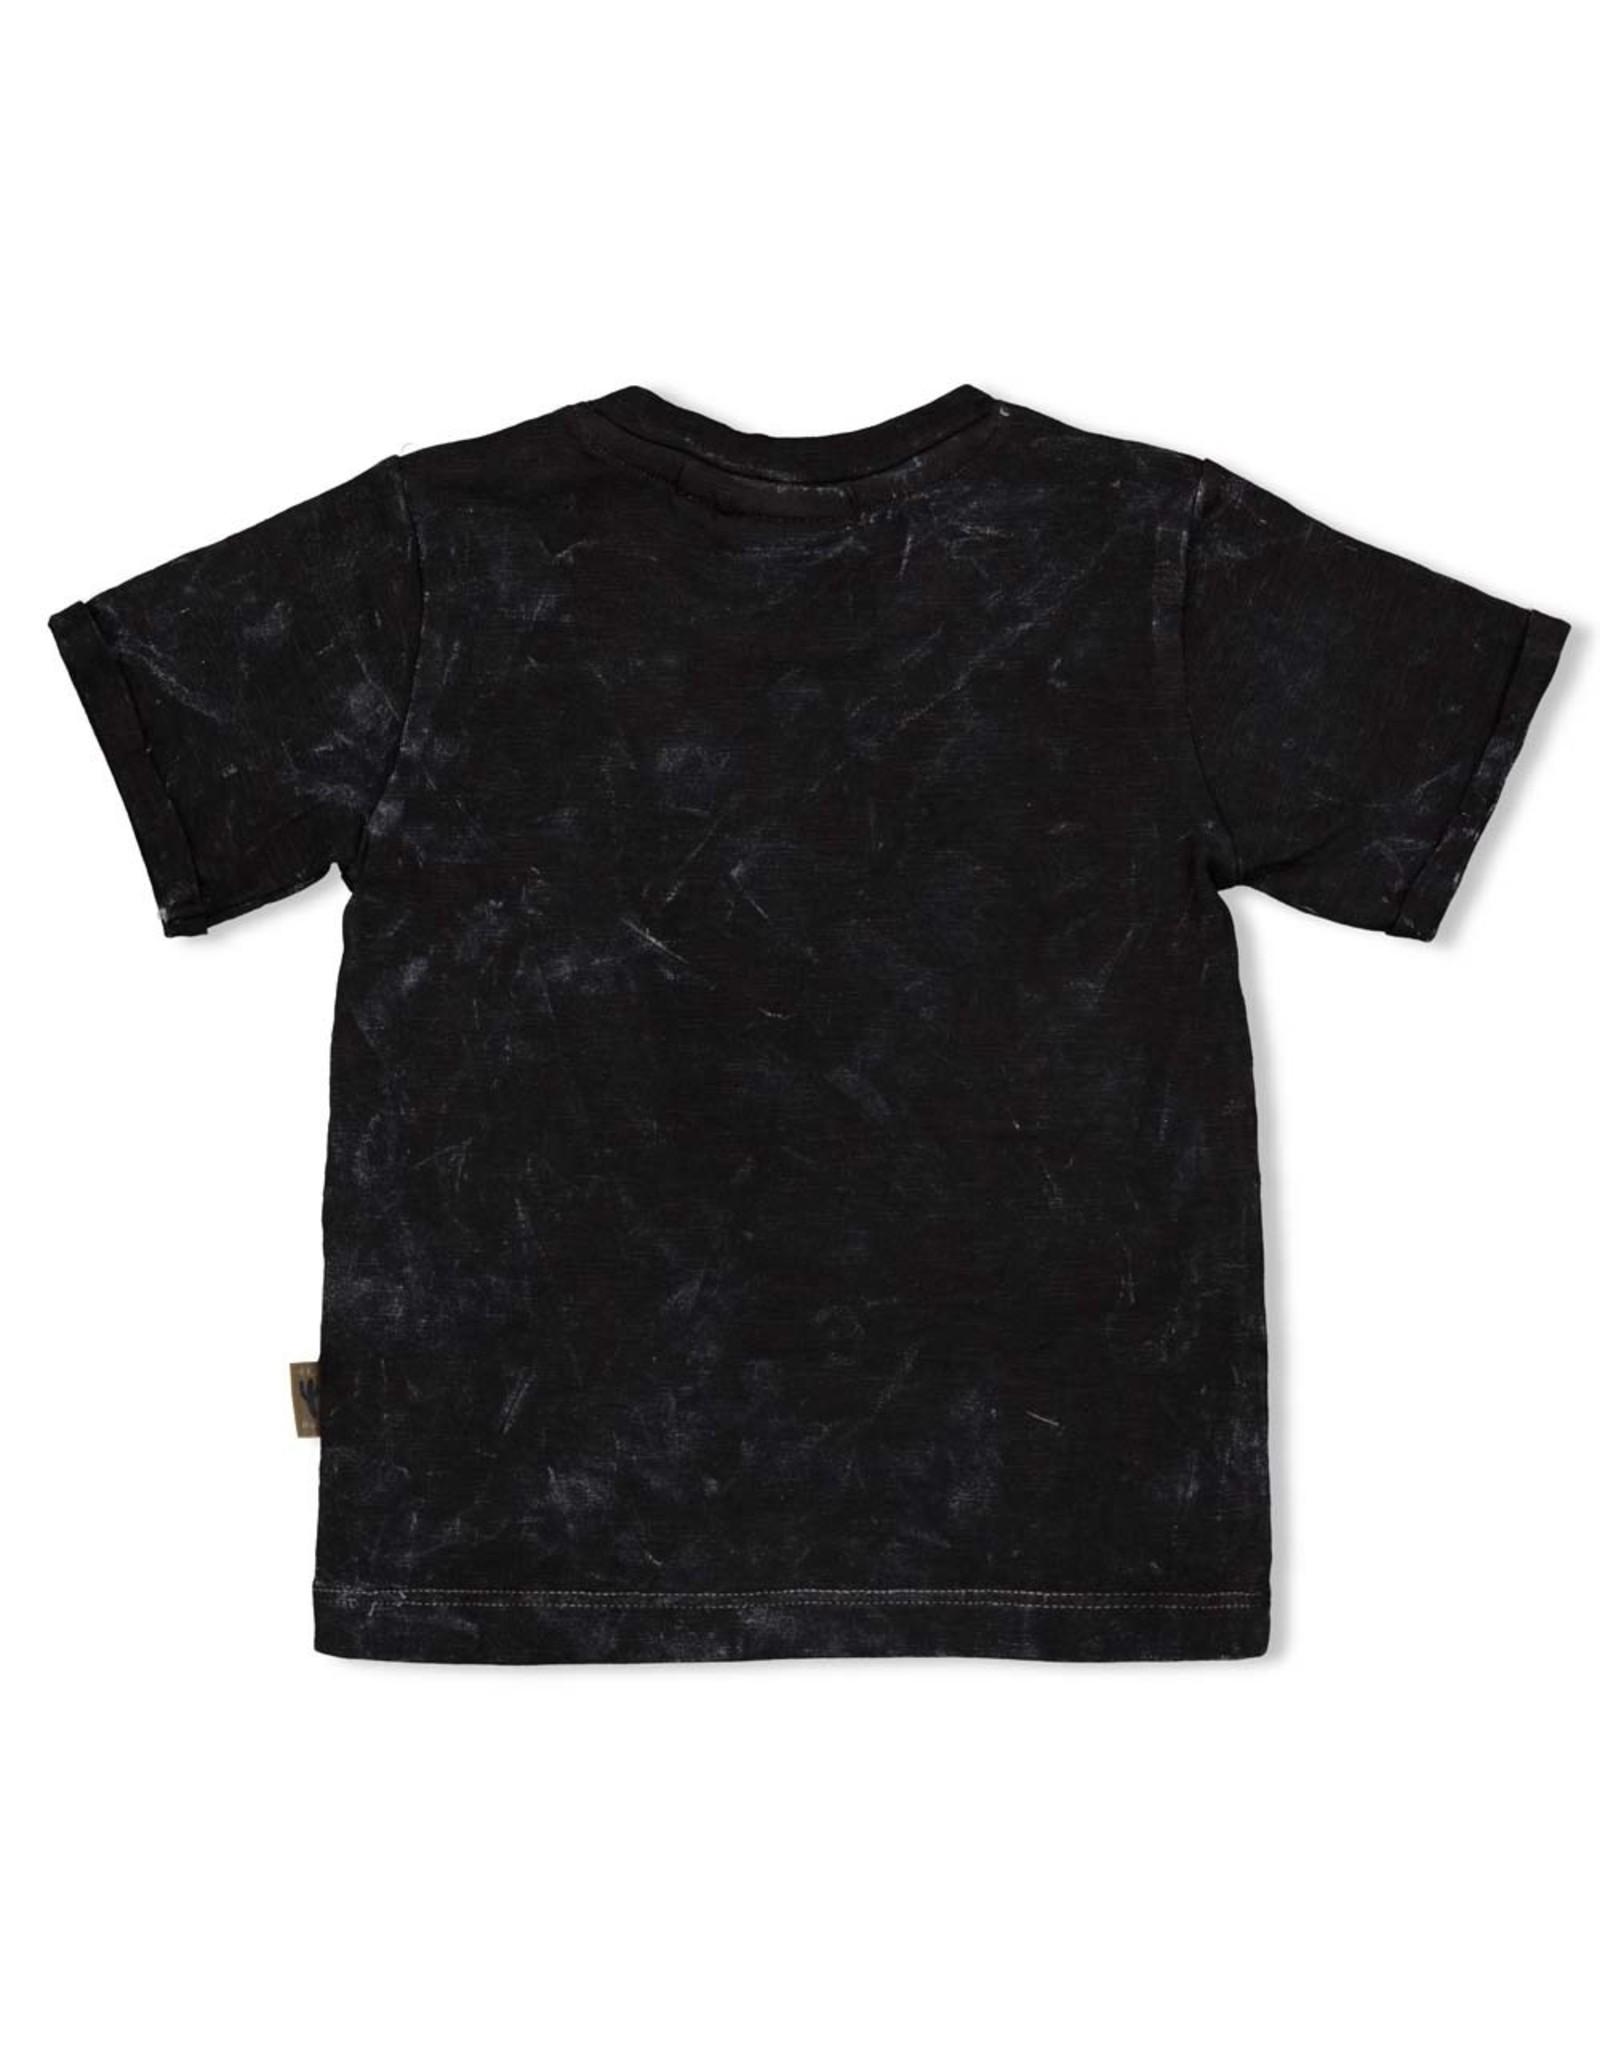 Feetje T-shirt Moments - Looking Sharp